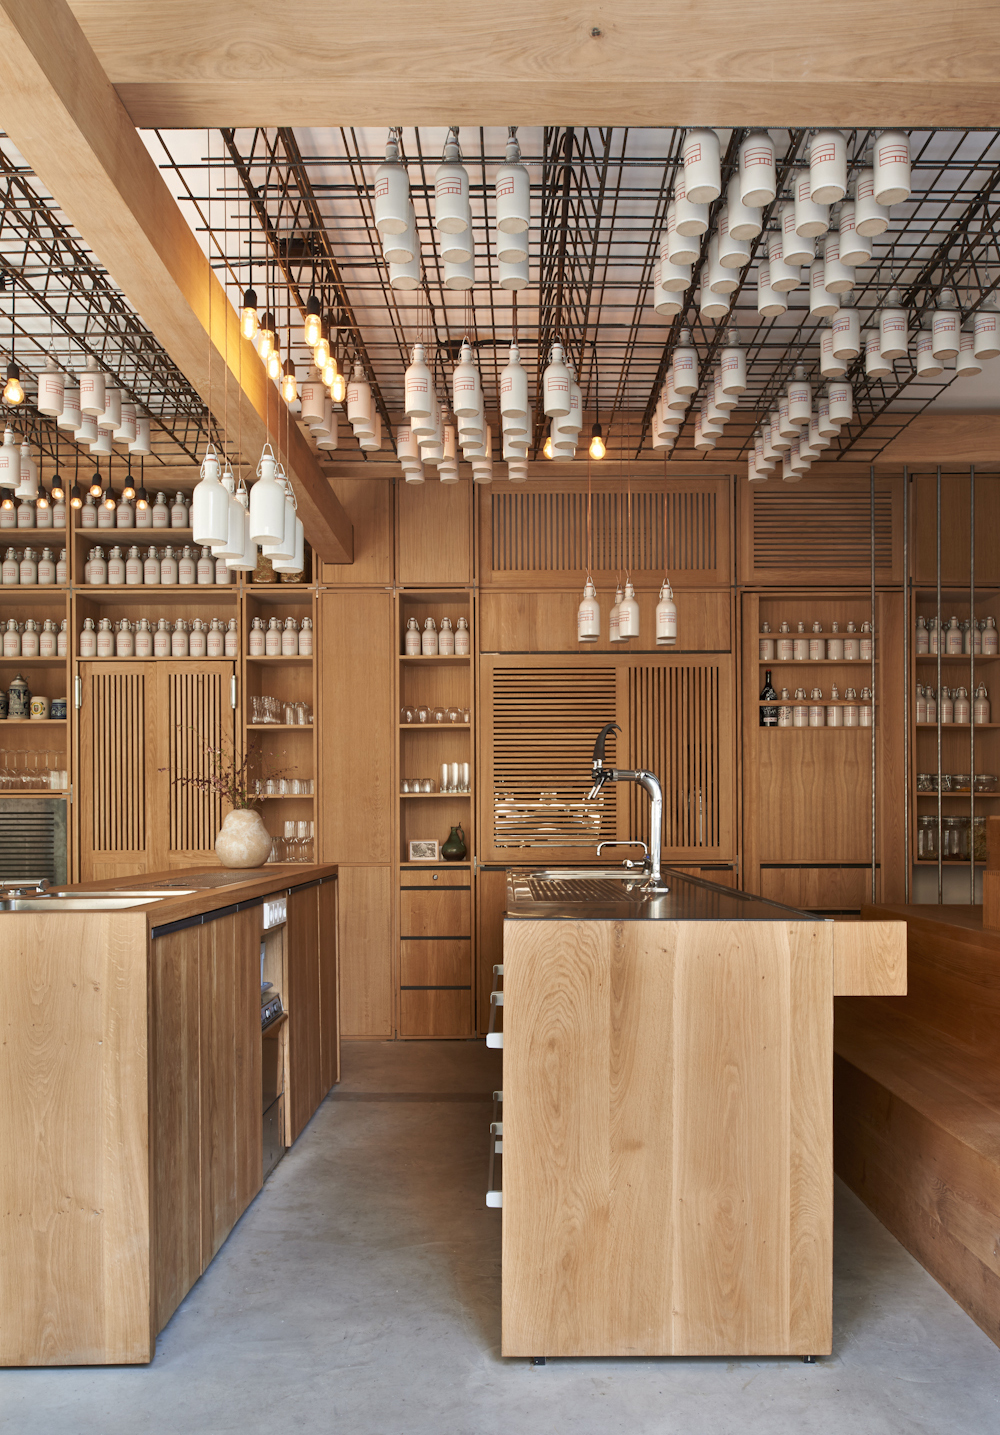 Gamsei-Buero-Wagner-Cocktail-Bar-2.jpg